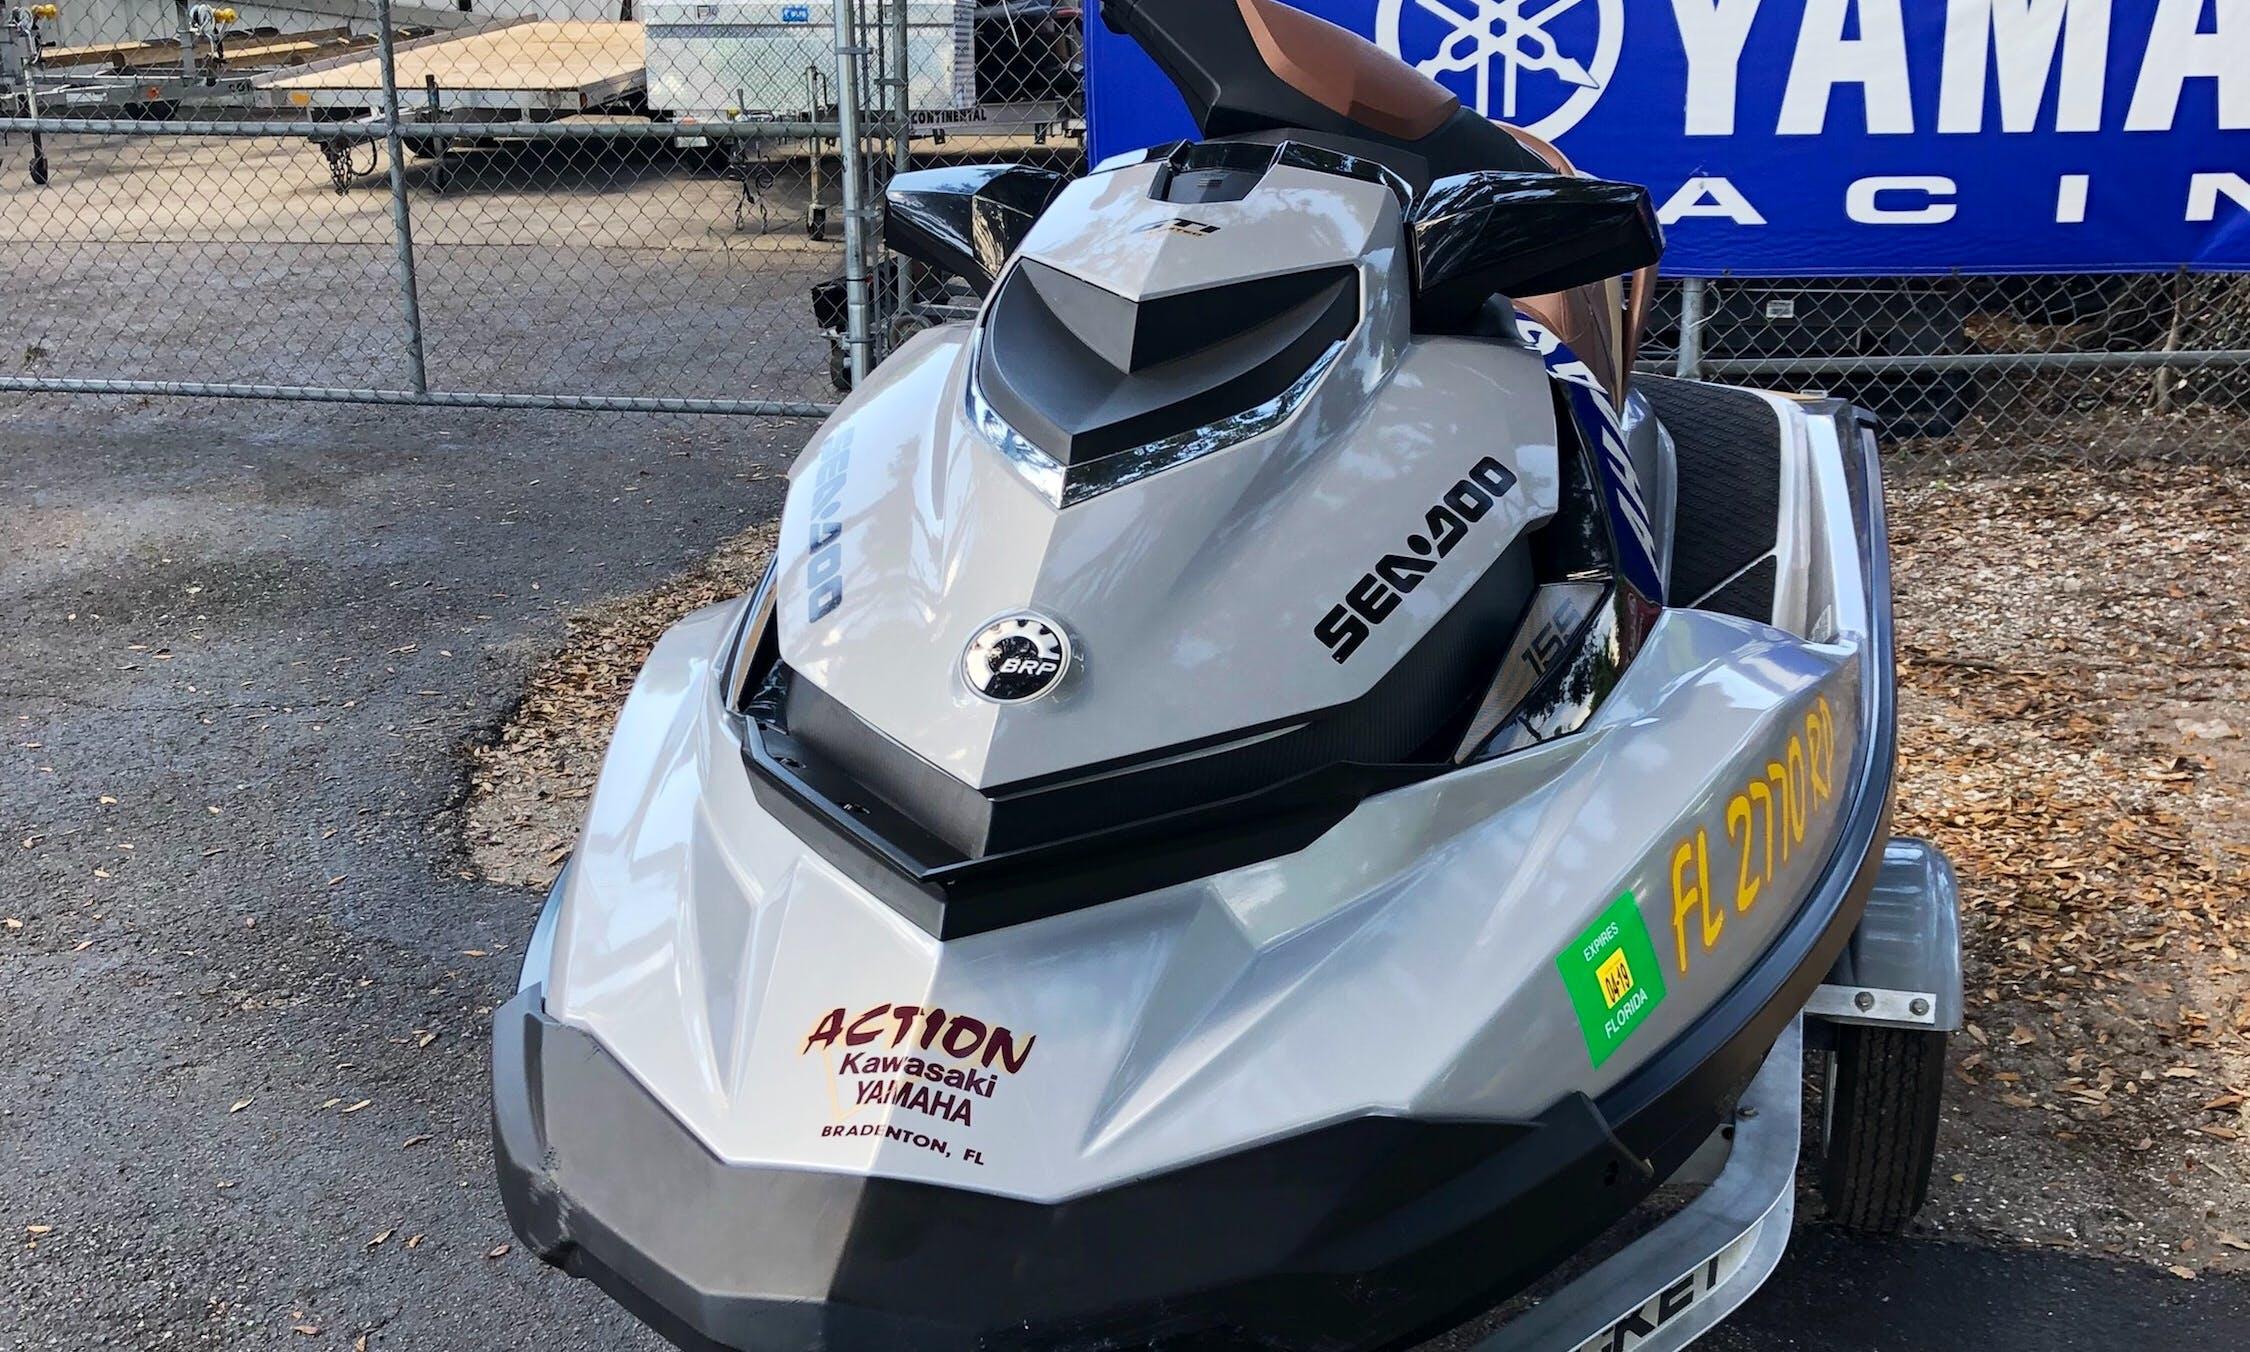 Rent This Sea Doo GTI LIMITED 155 Jet Ski in Sarasota